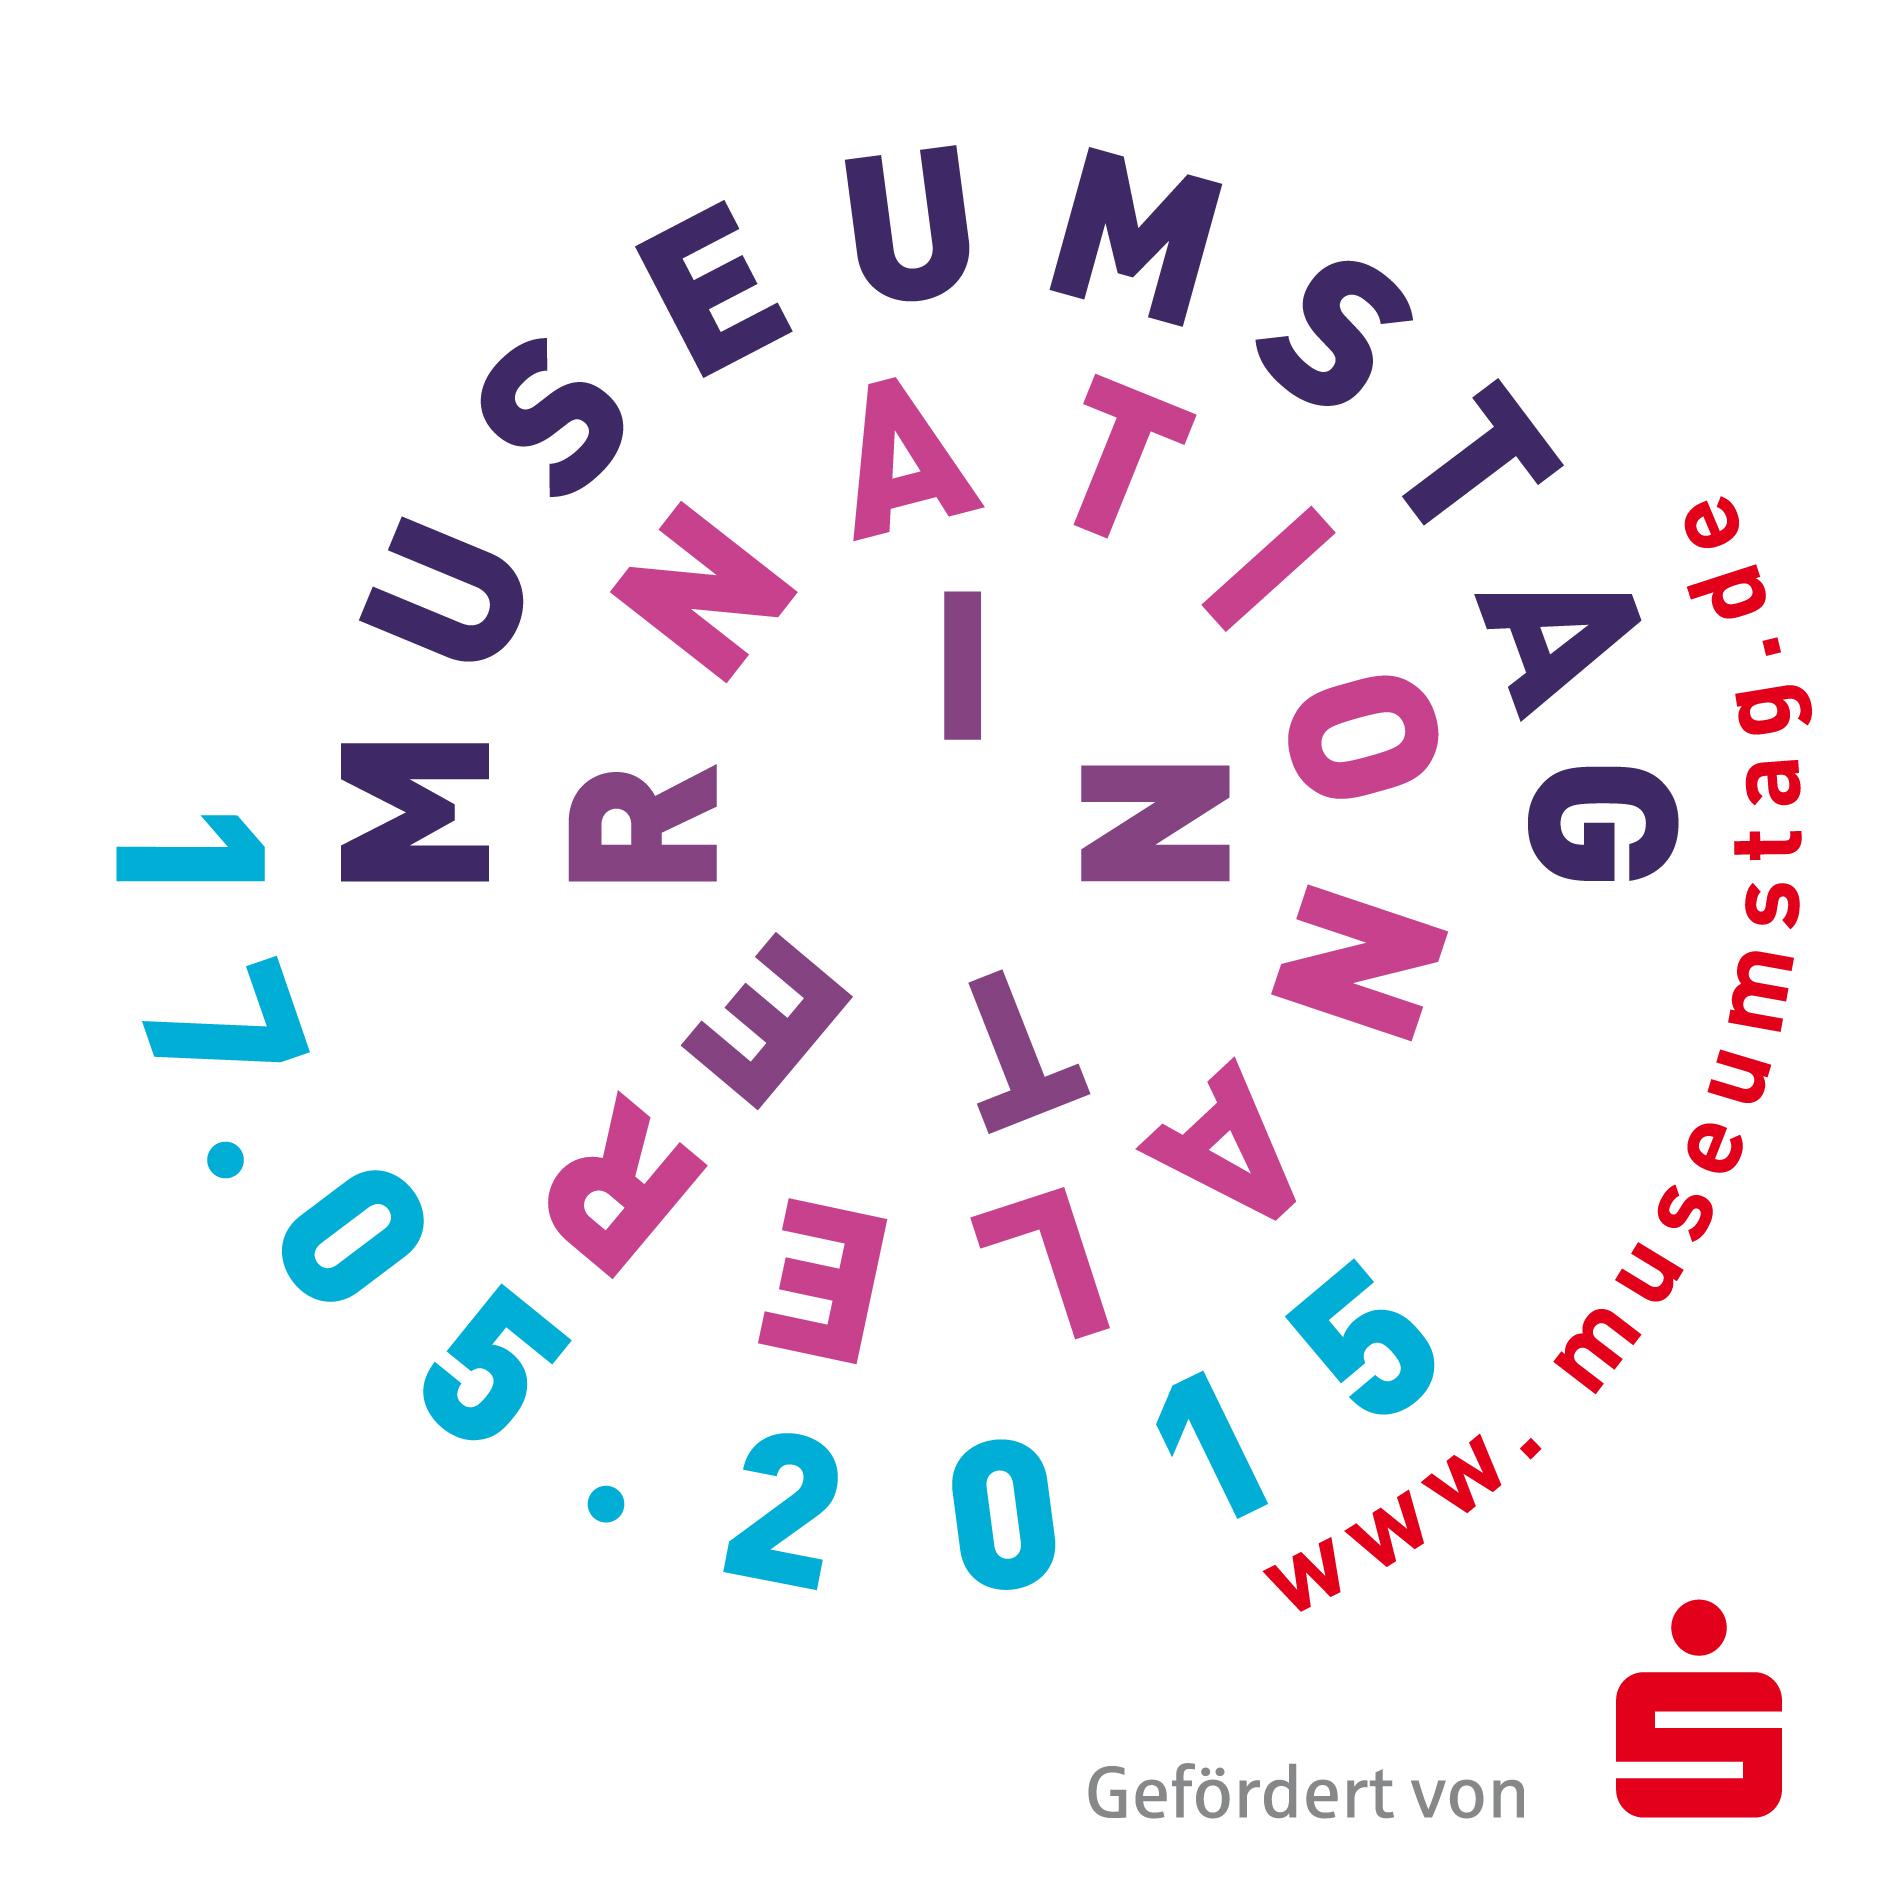 38. Internationalen Museumstag